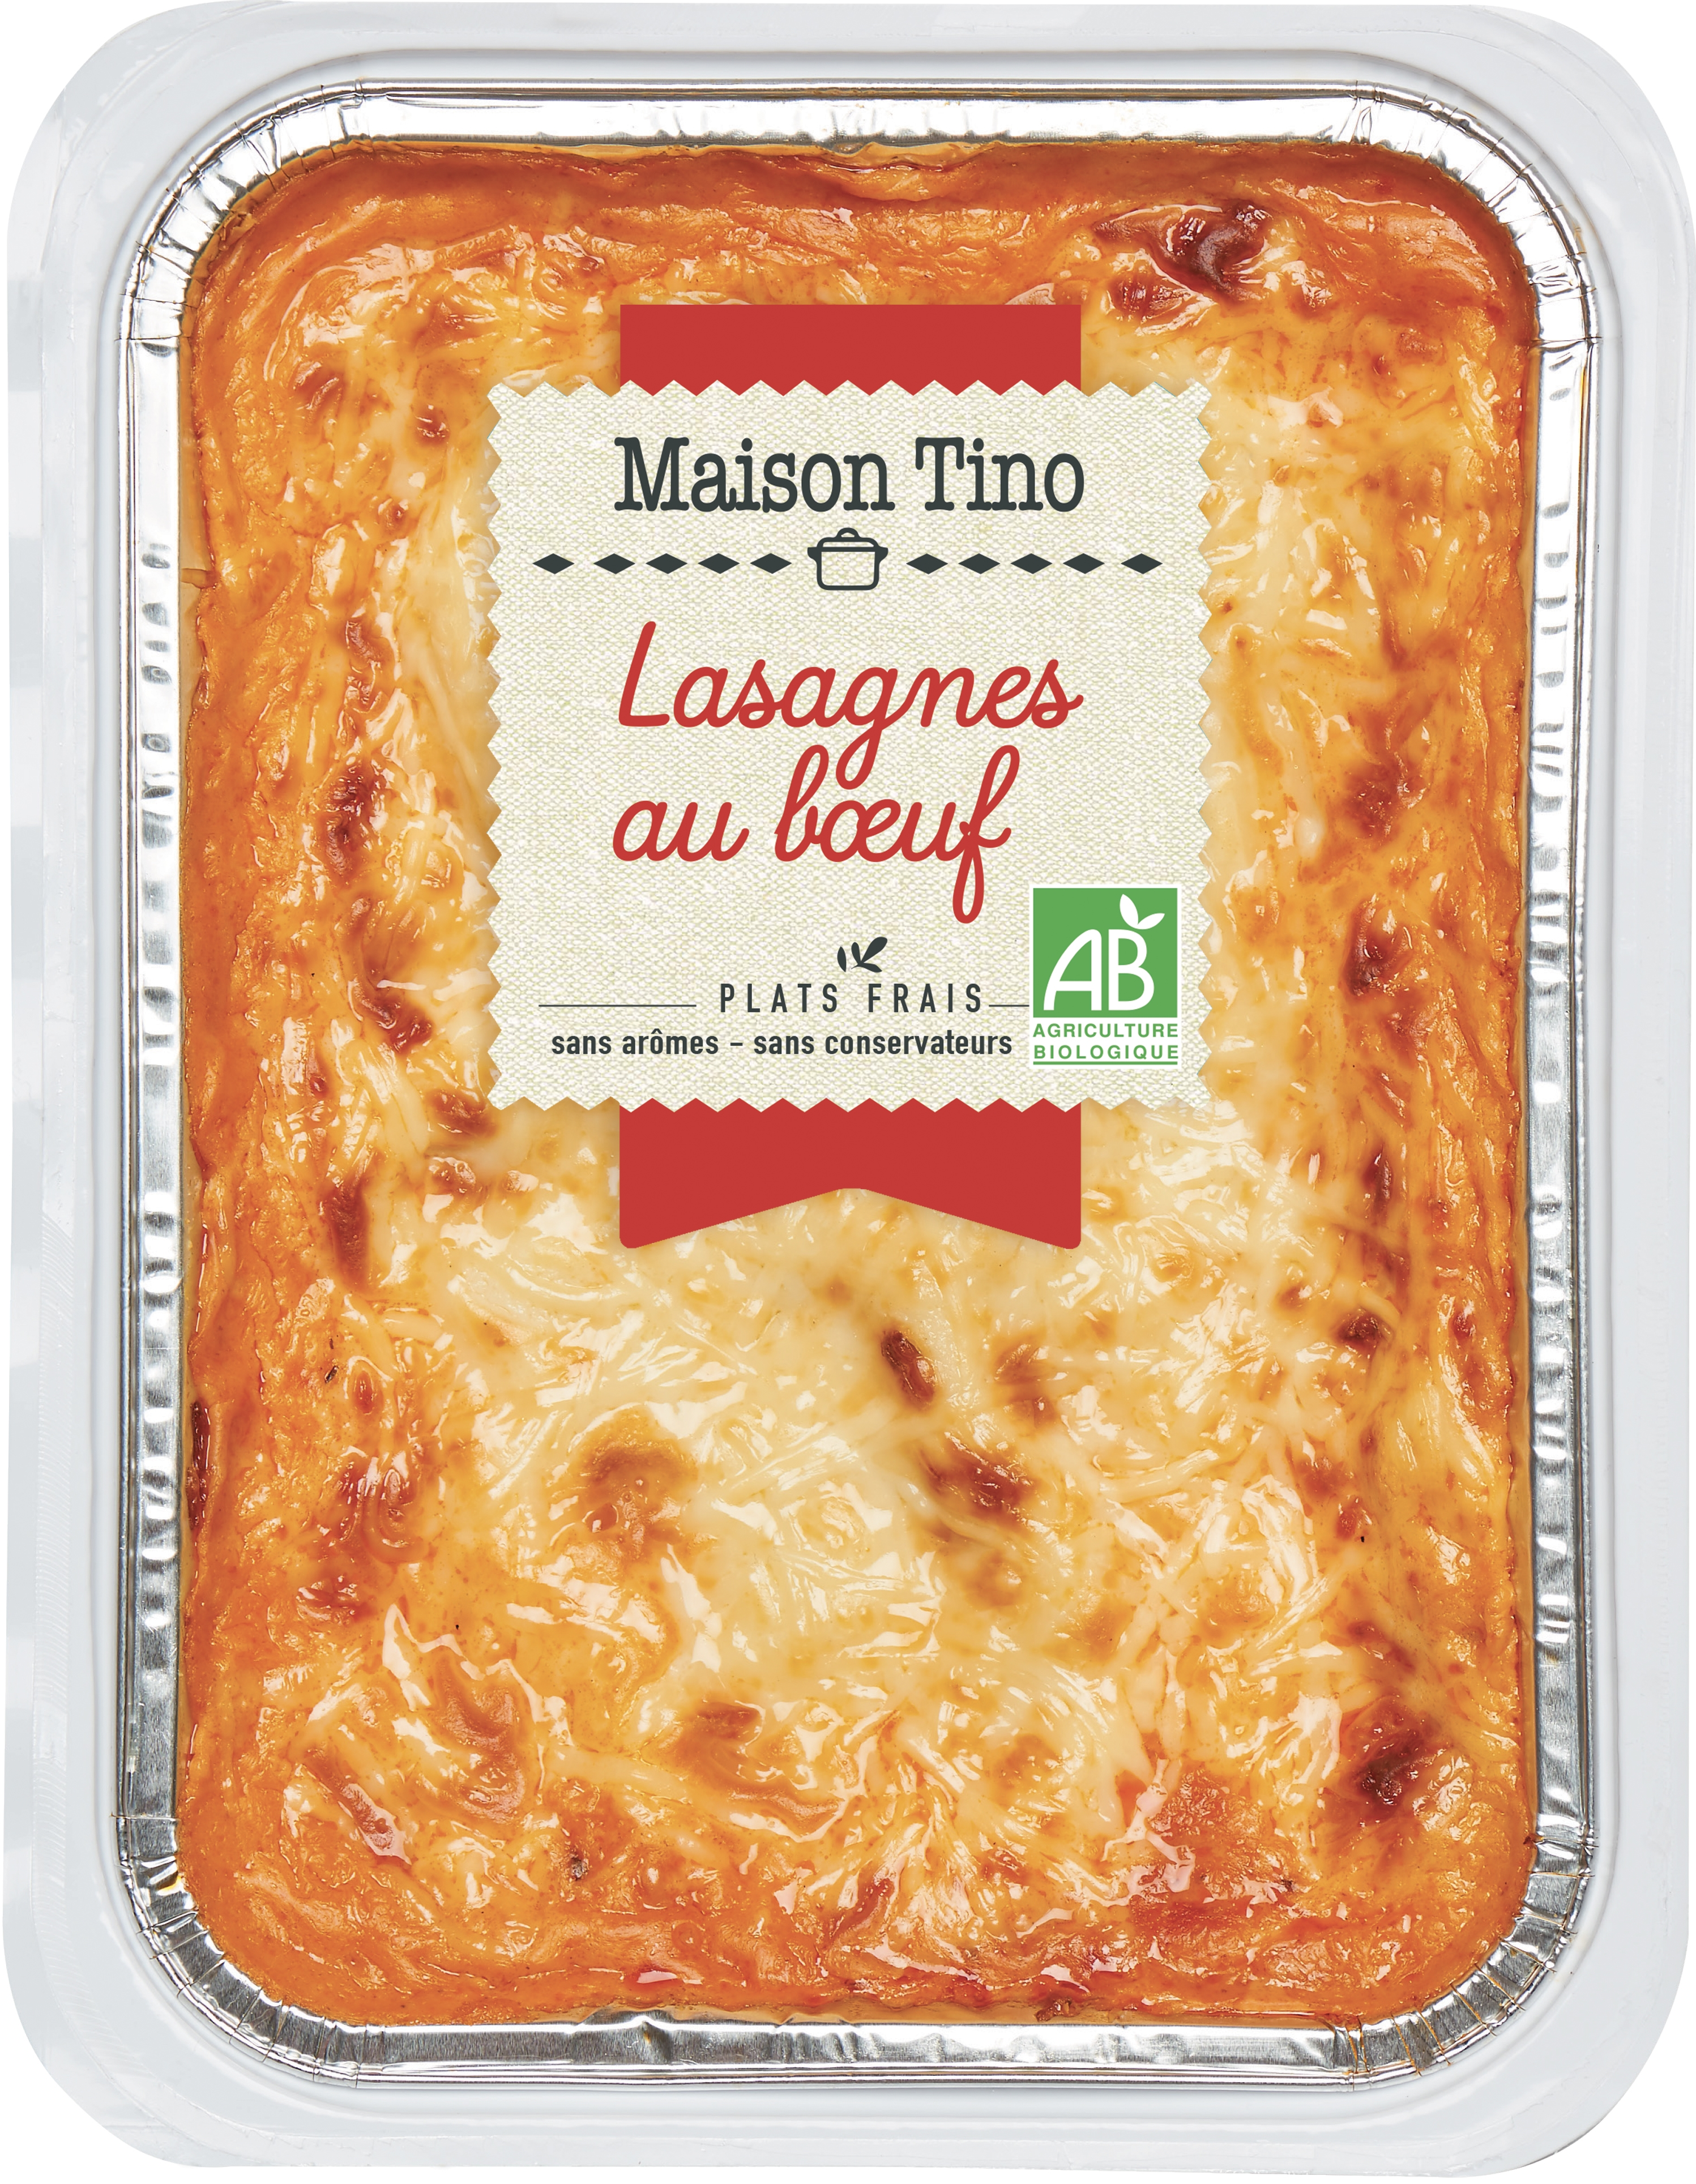 Lasagnes au boeuf BIO, Maison Tino (550 g)